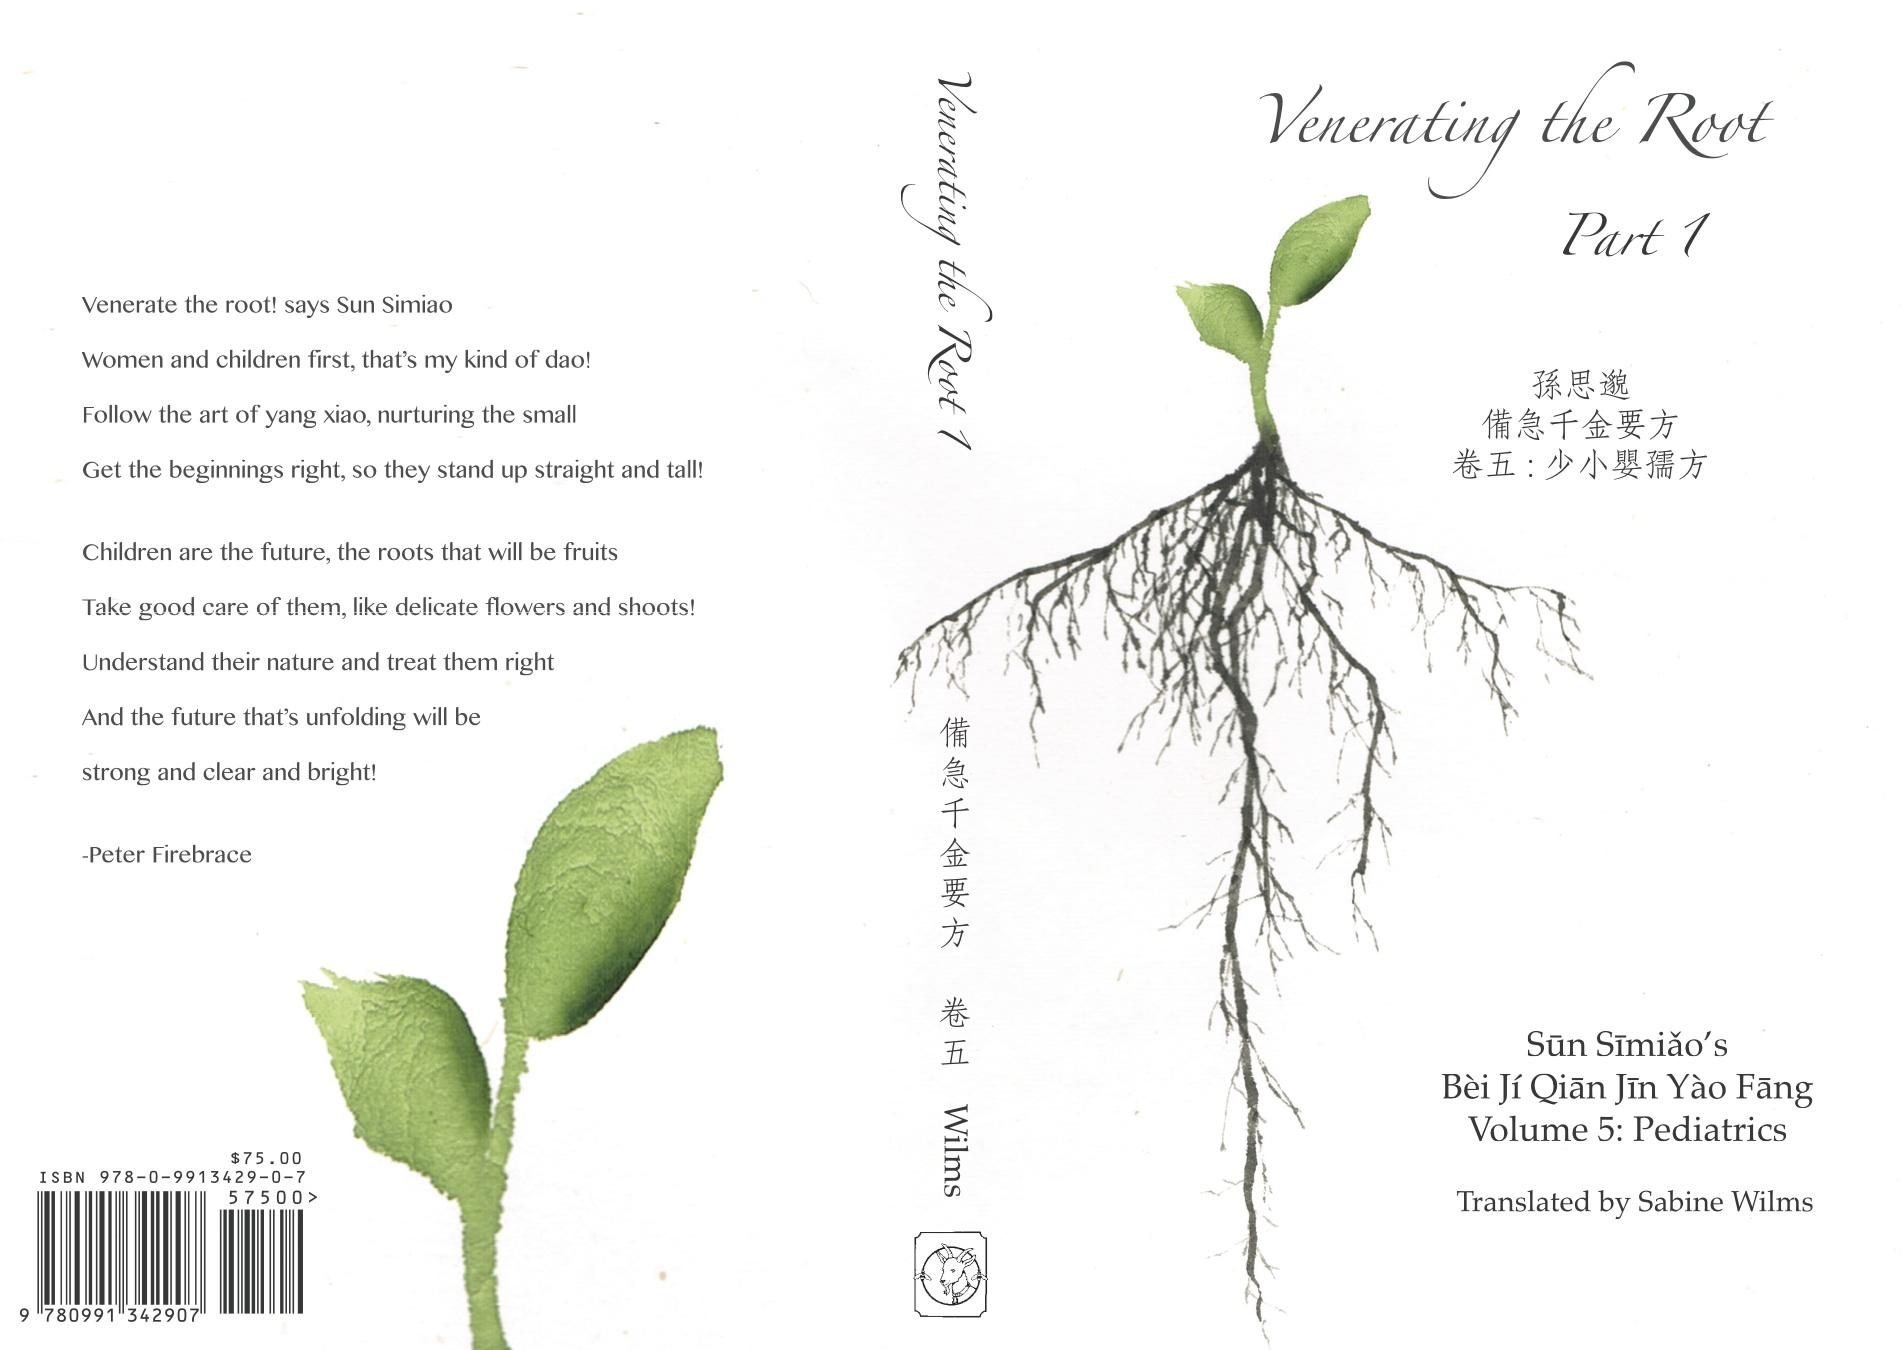 Venerating The Root: Part 1